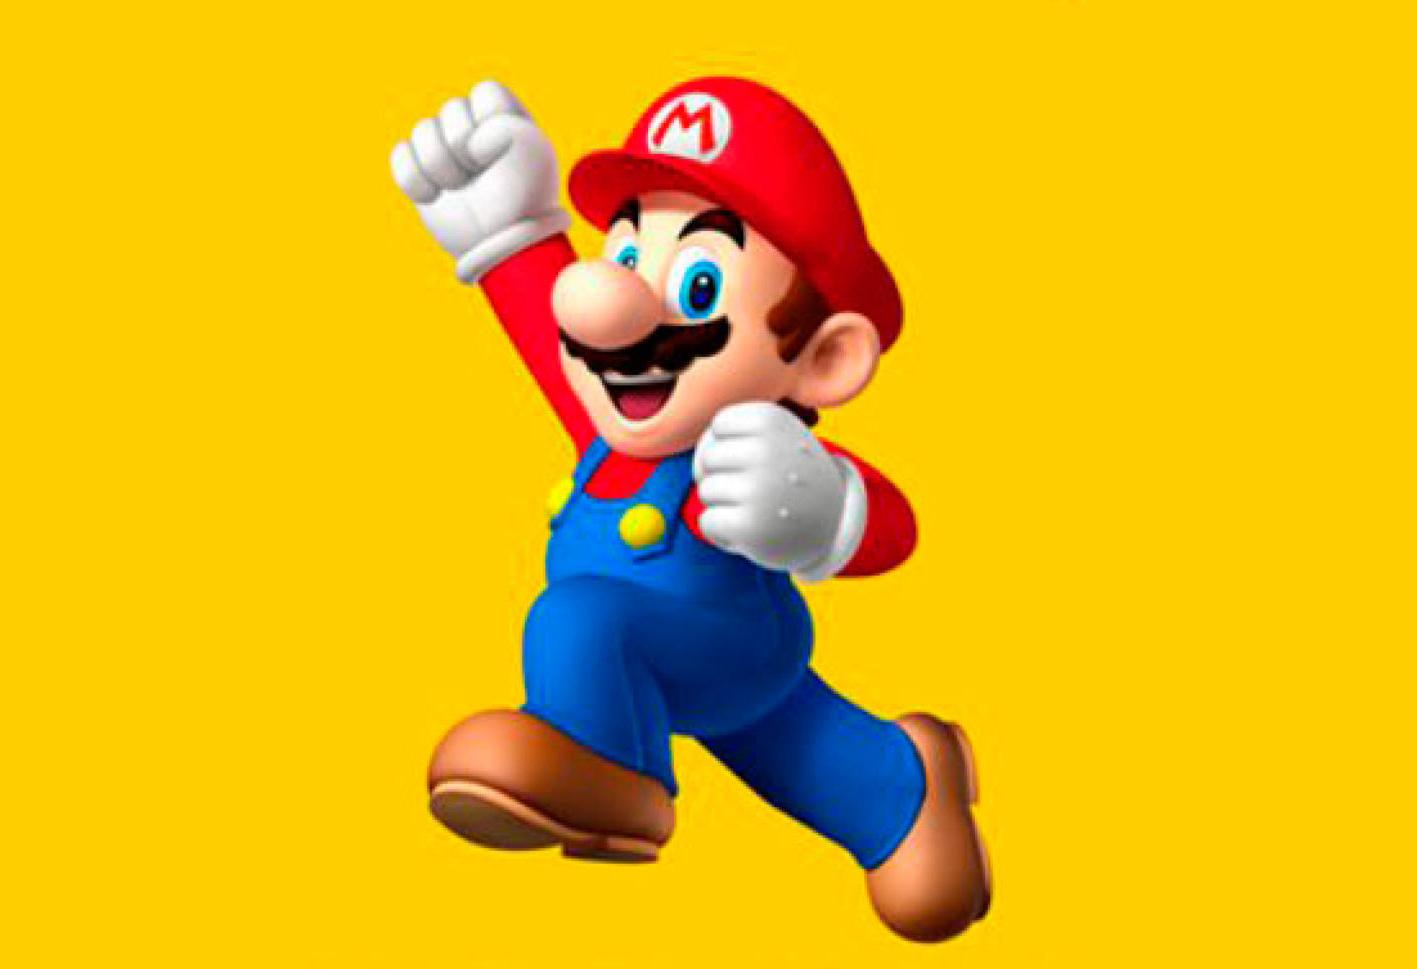 Happy Birthday Mario! Nintendo's Iconic Game Character